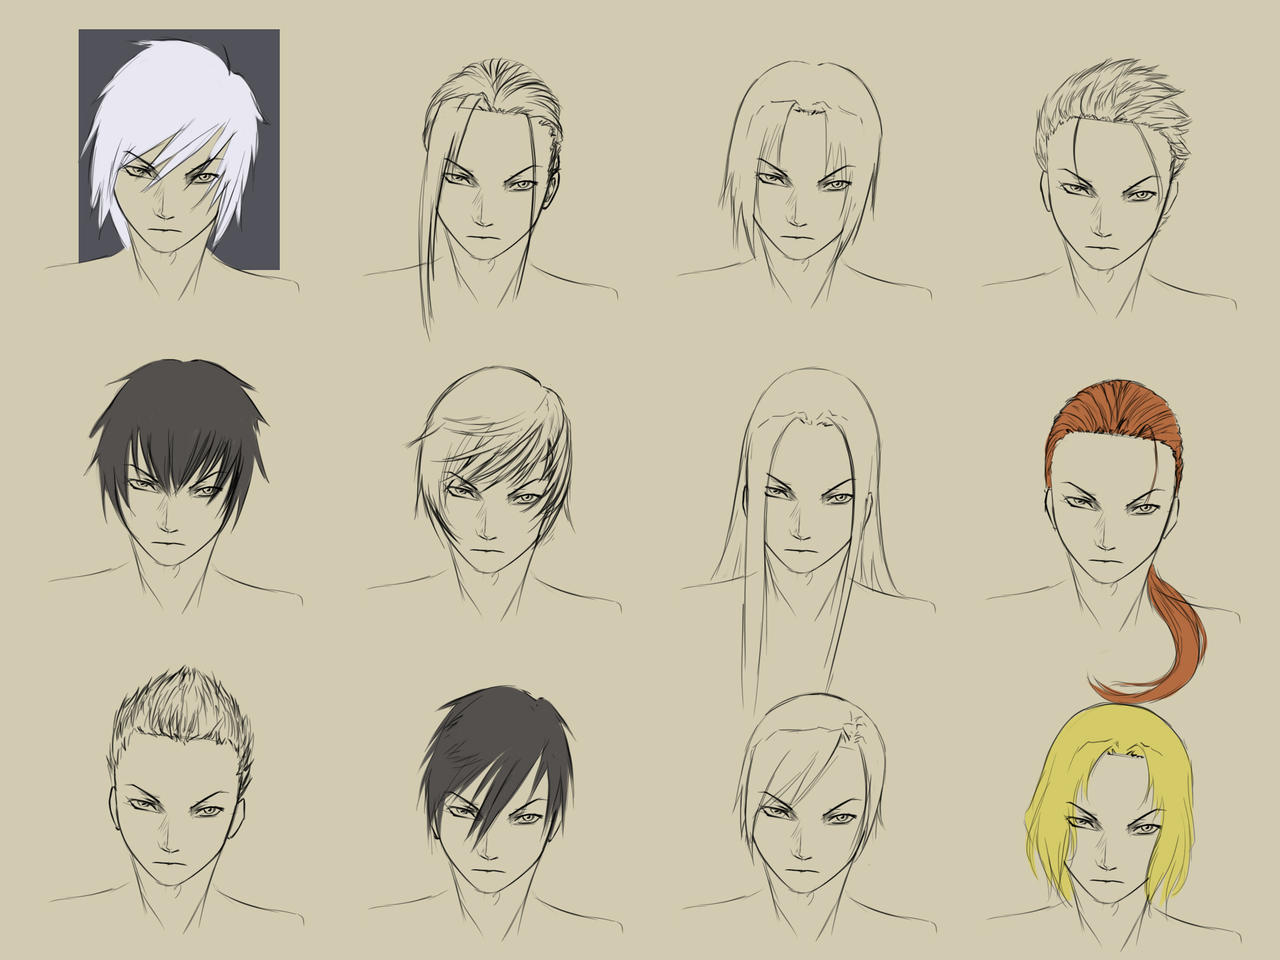 Male Hairstyles By Forgotten-wings On DeviantArt